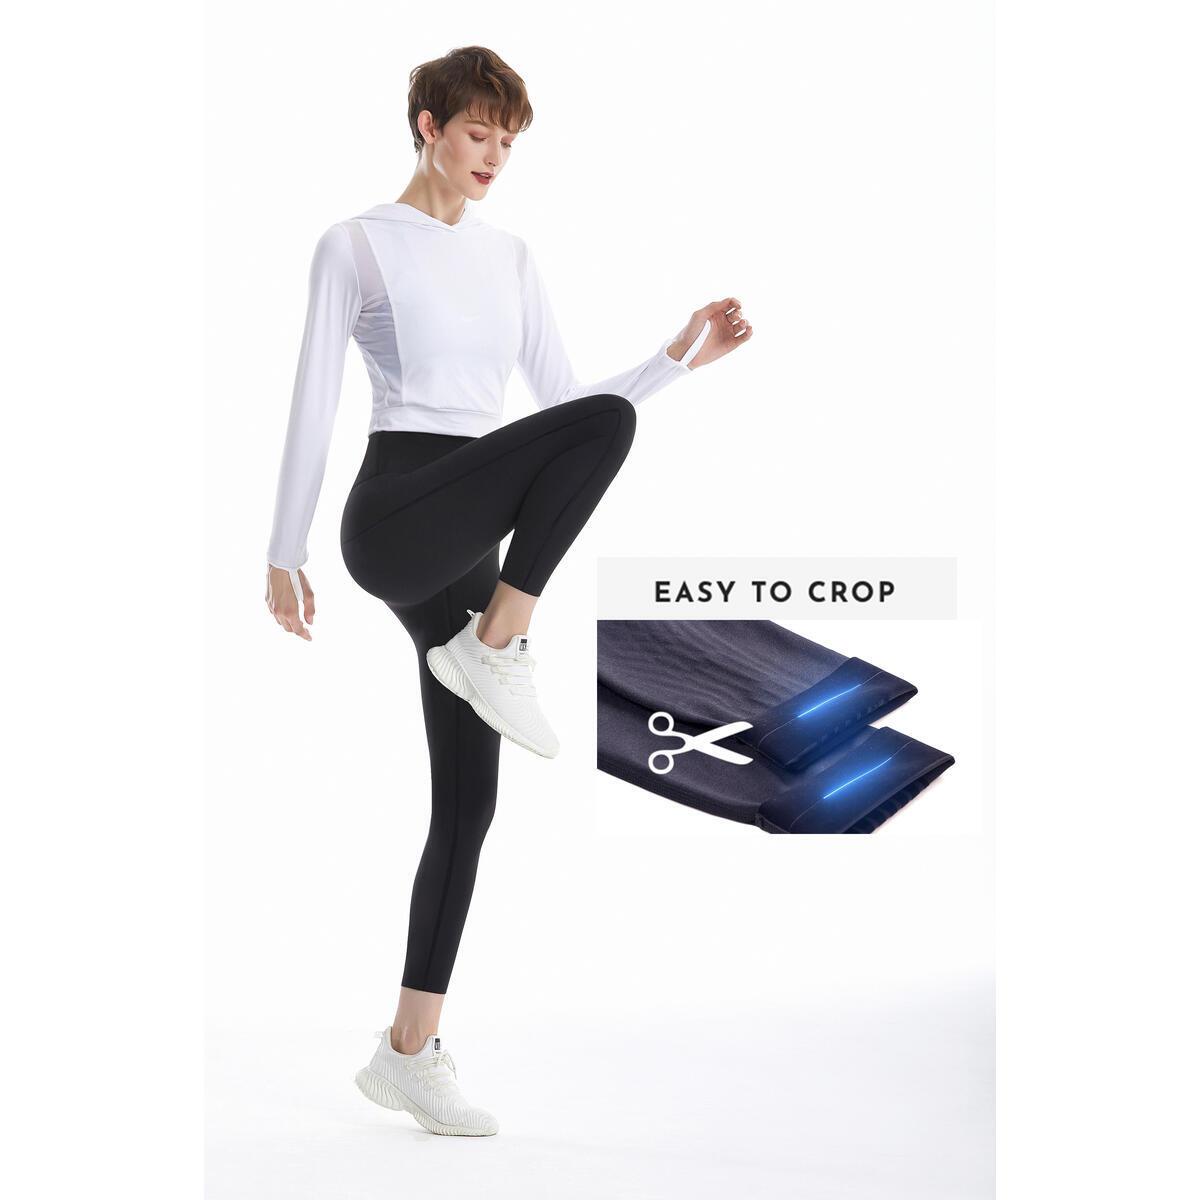 Adira Activewear Workout Leggings, Urban-Inspired, Versatile Leggings, Ultimate Warmth and Day-to-Night Comfort